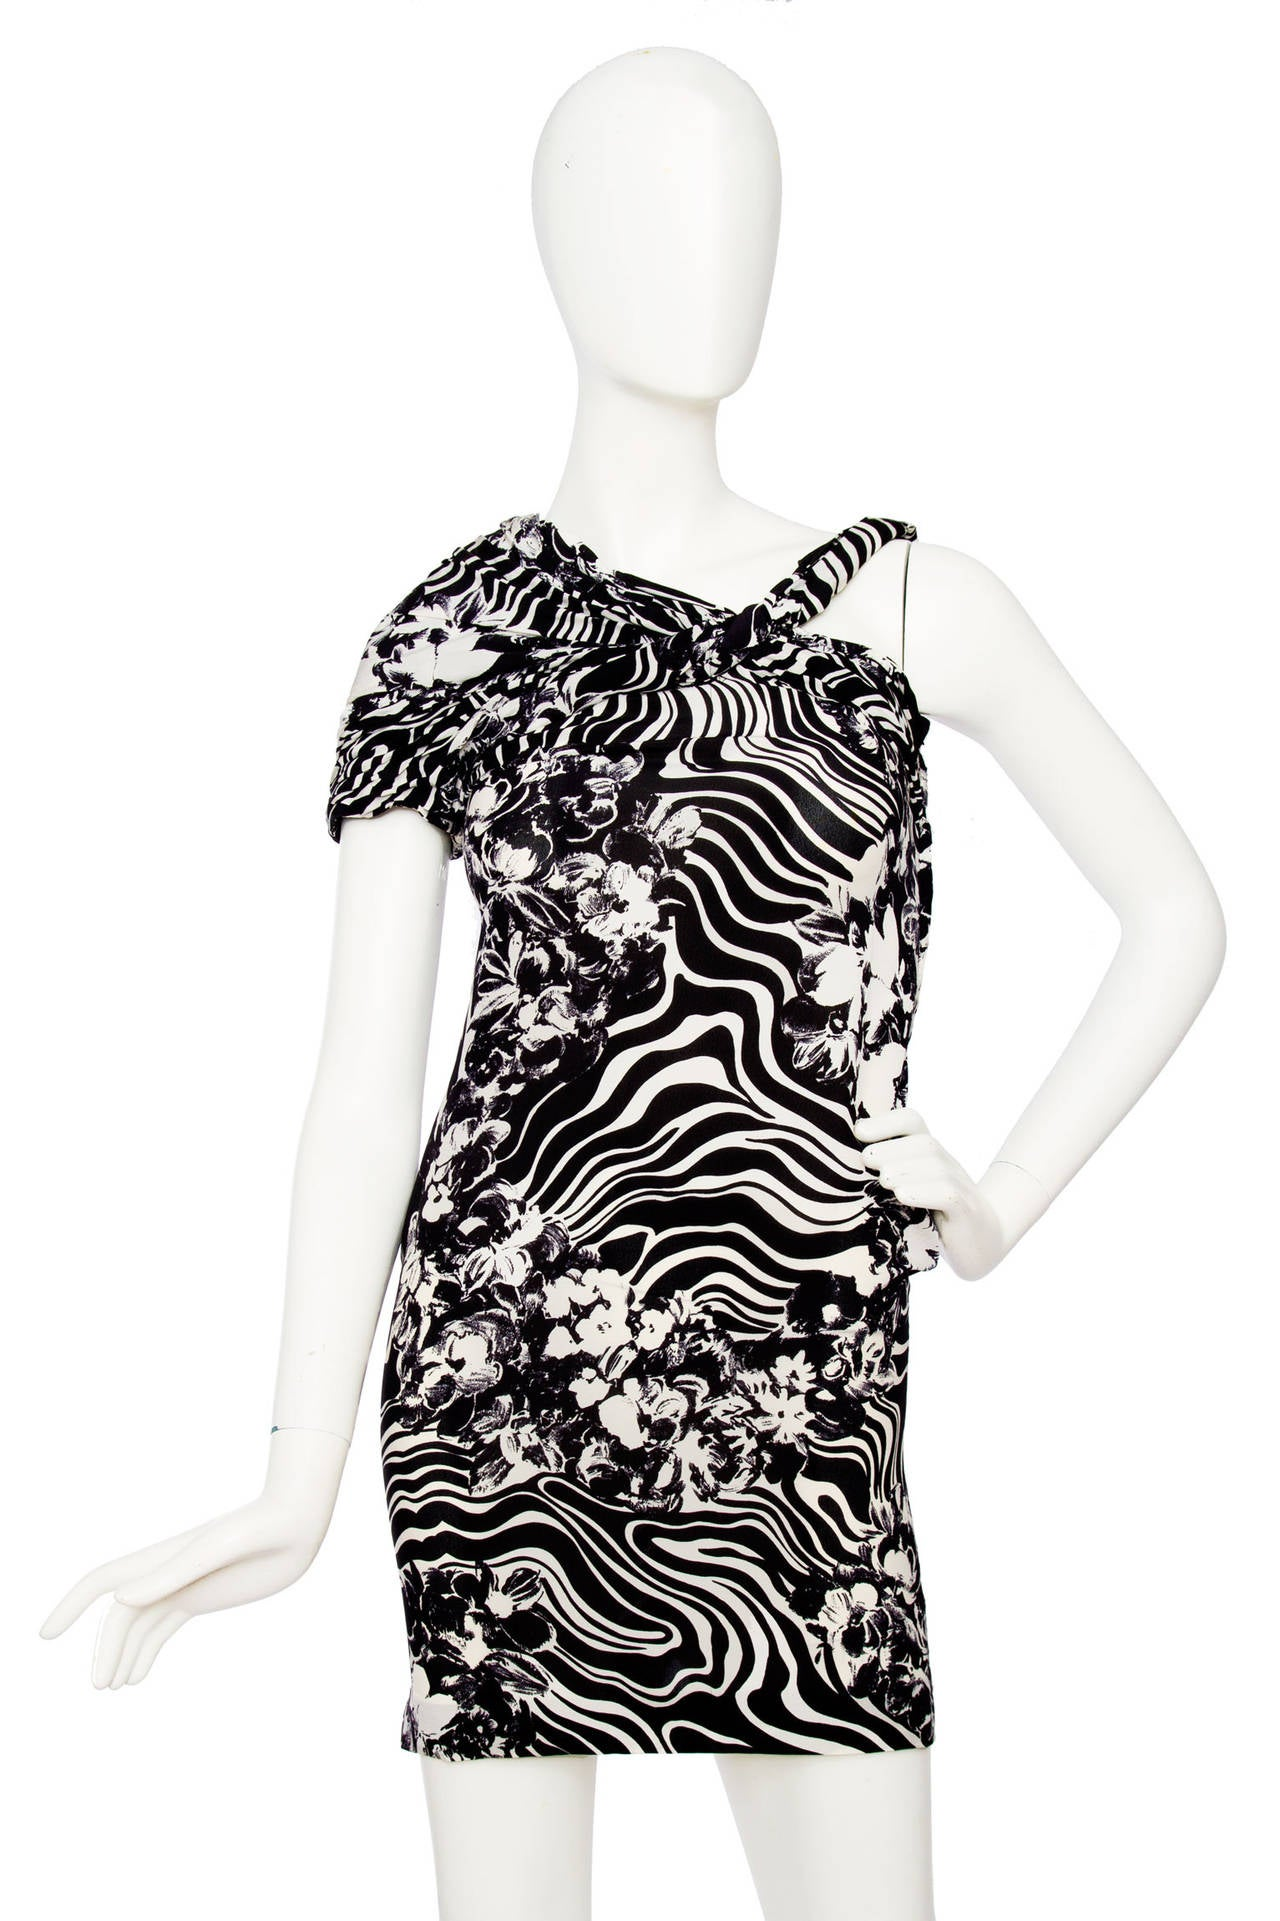 1980s Gianni Versace Monochrome Silk Dress 2